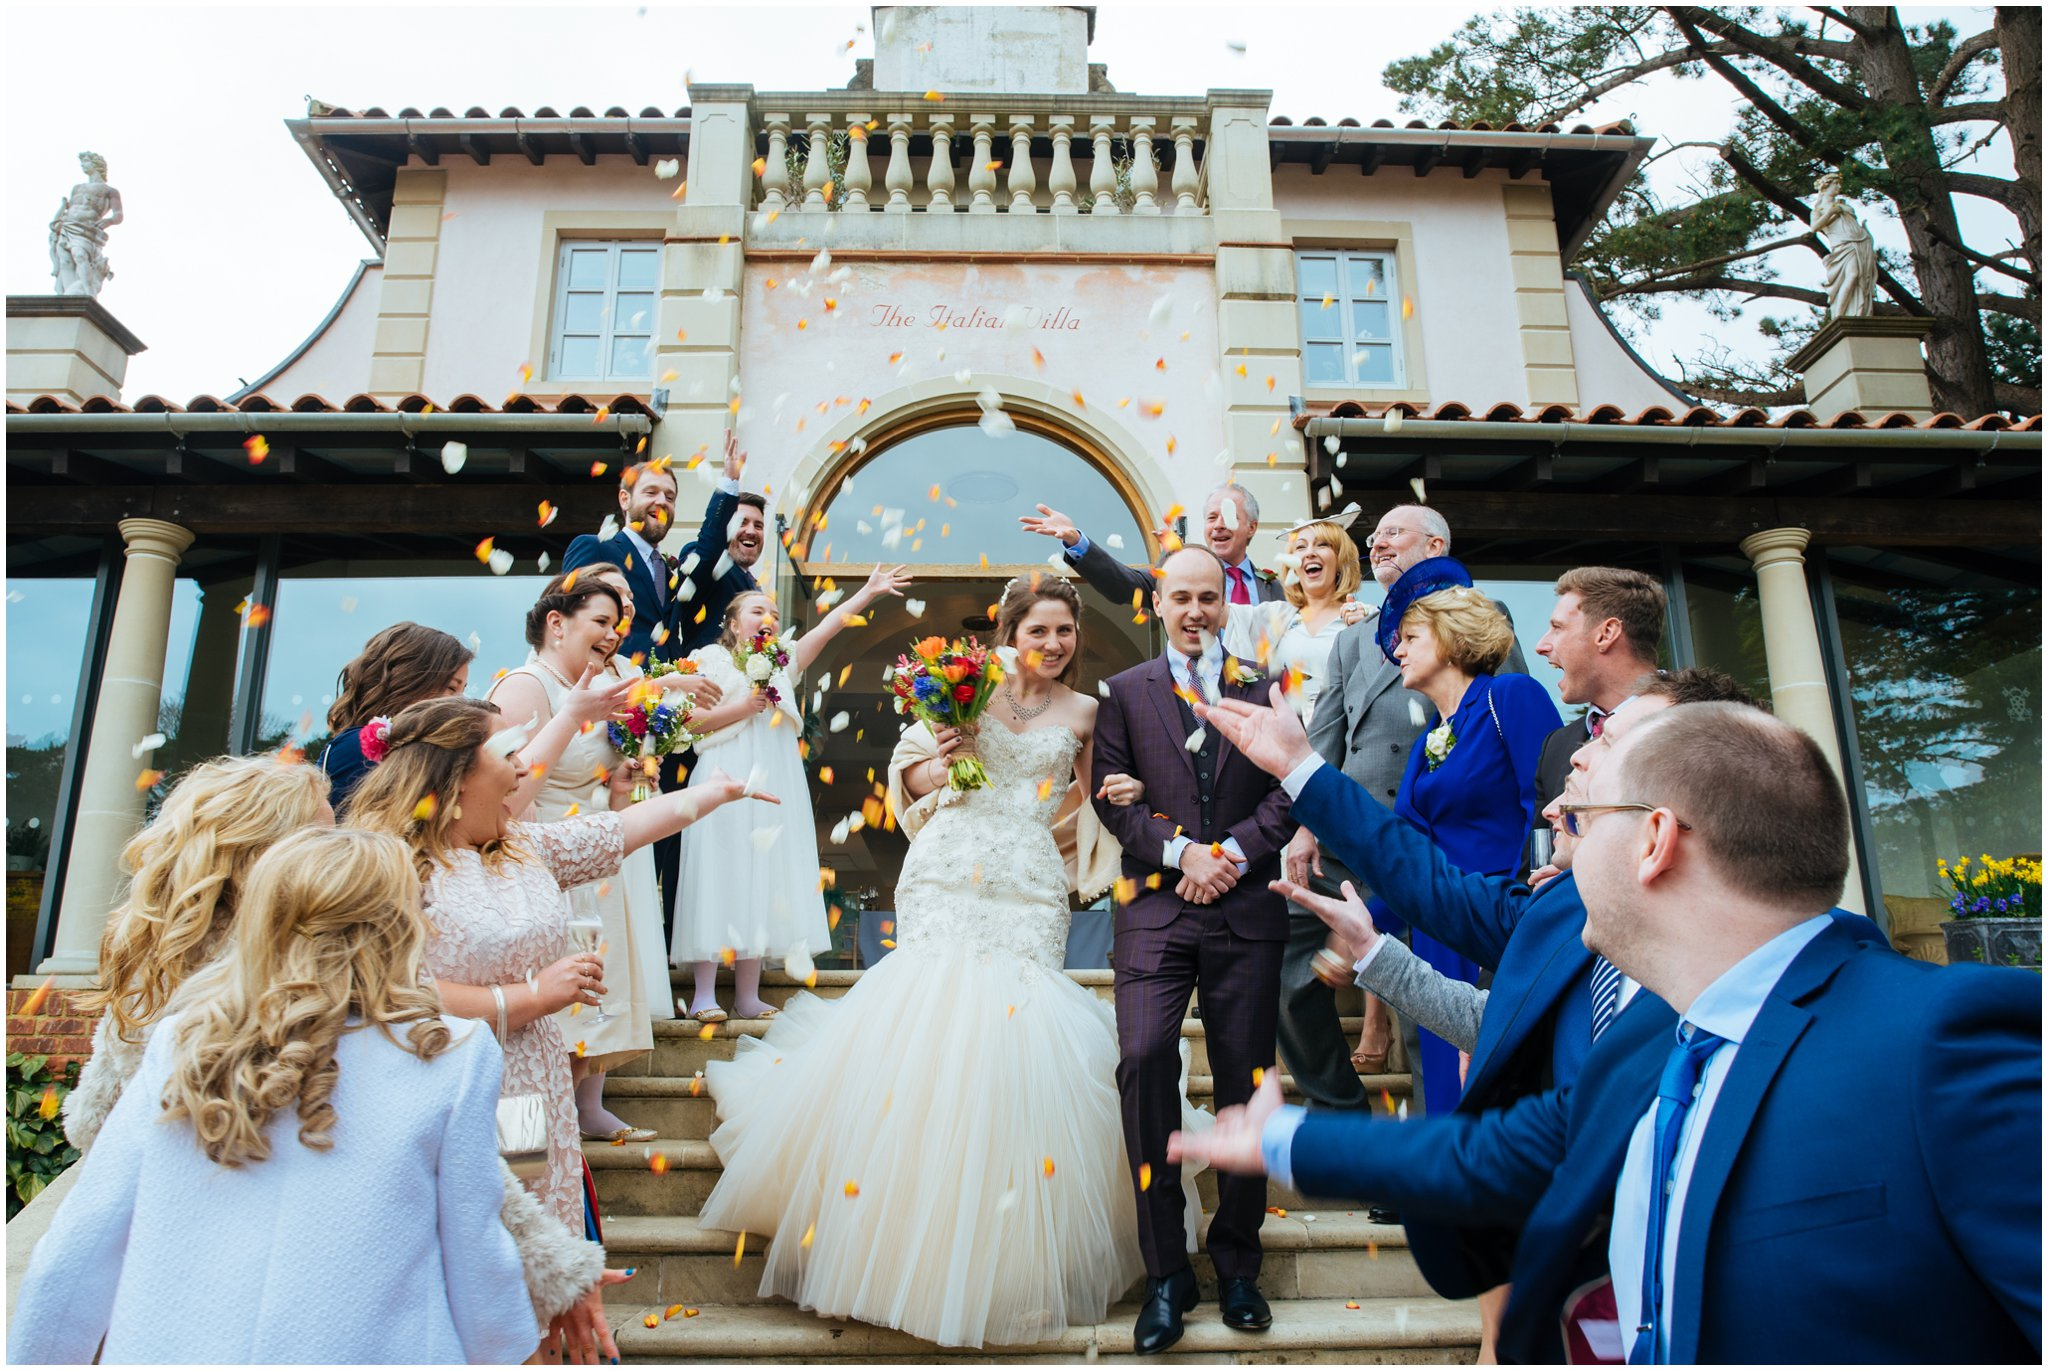 Italian Villa Poole wedding